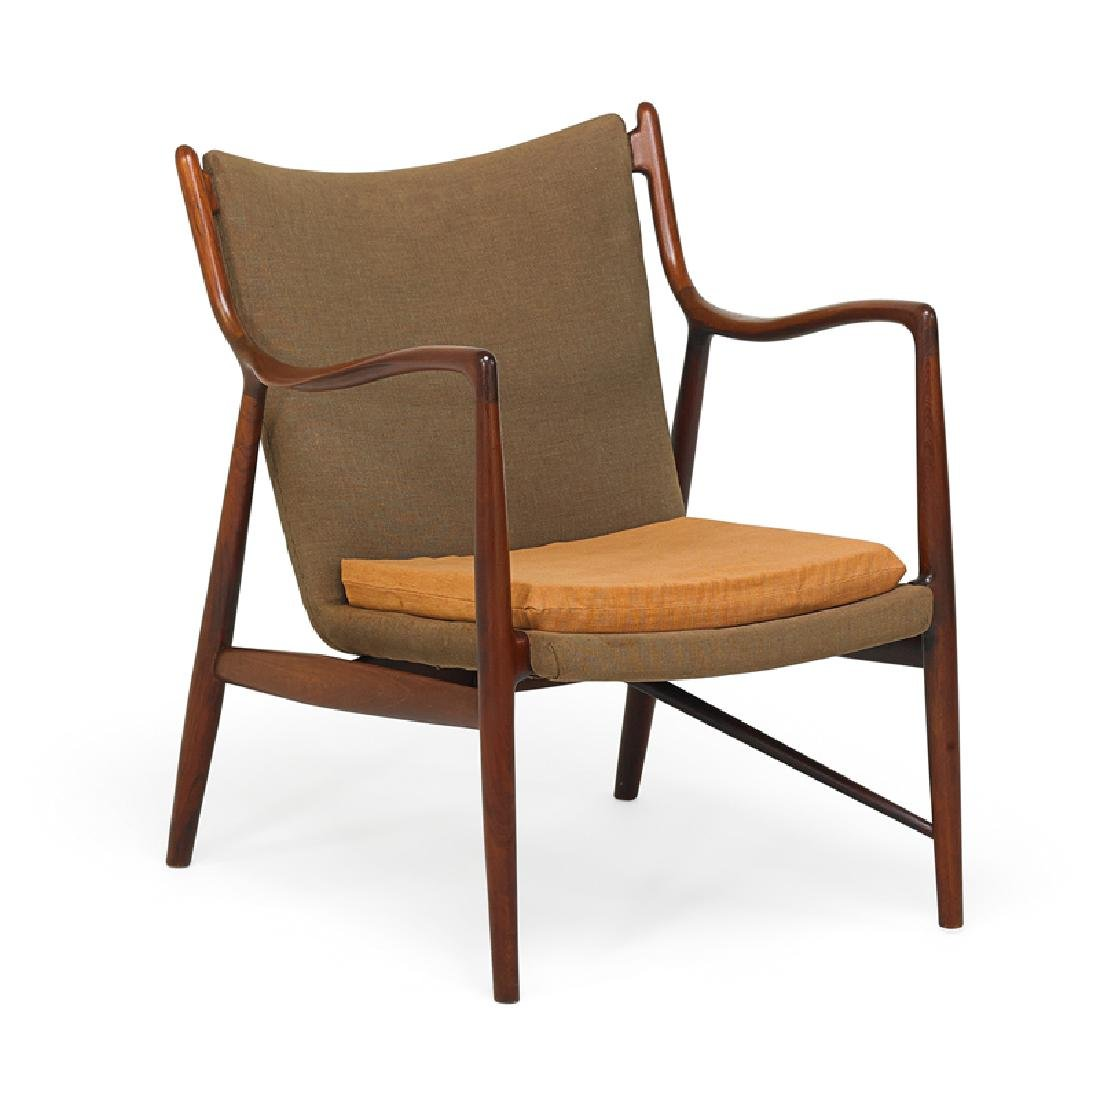 FINN JUHL NV-45 lounge chair